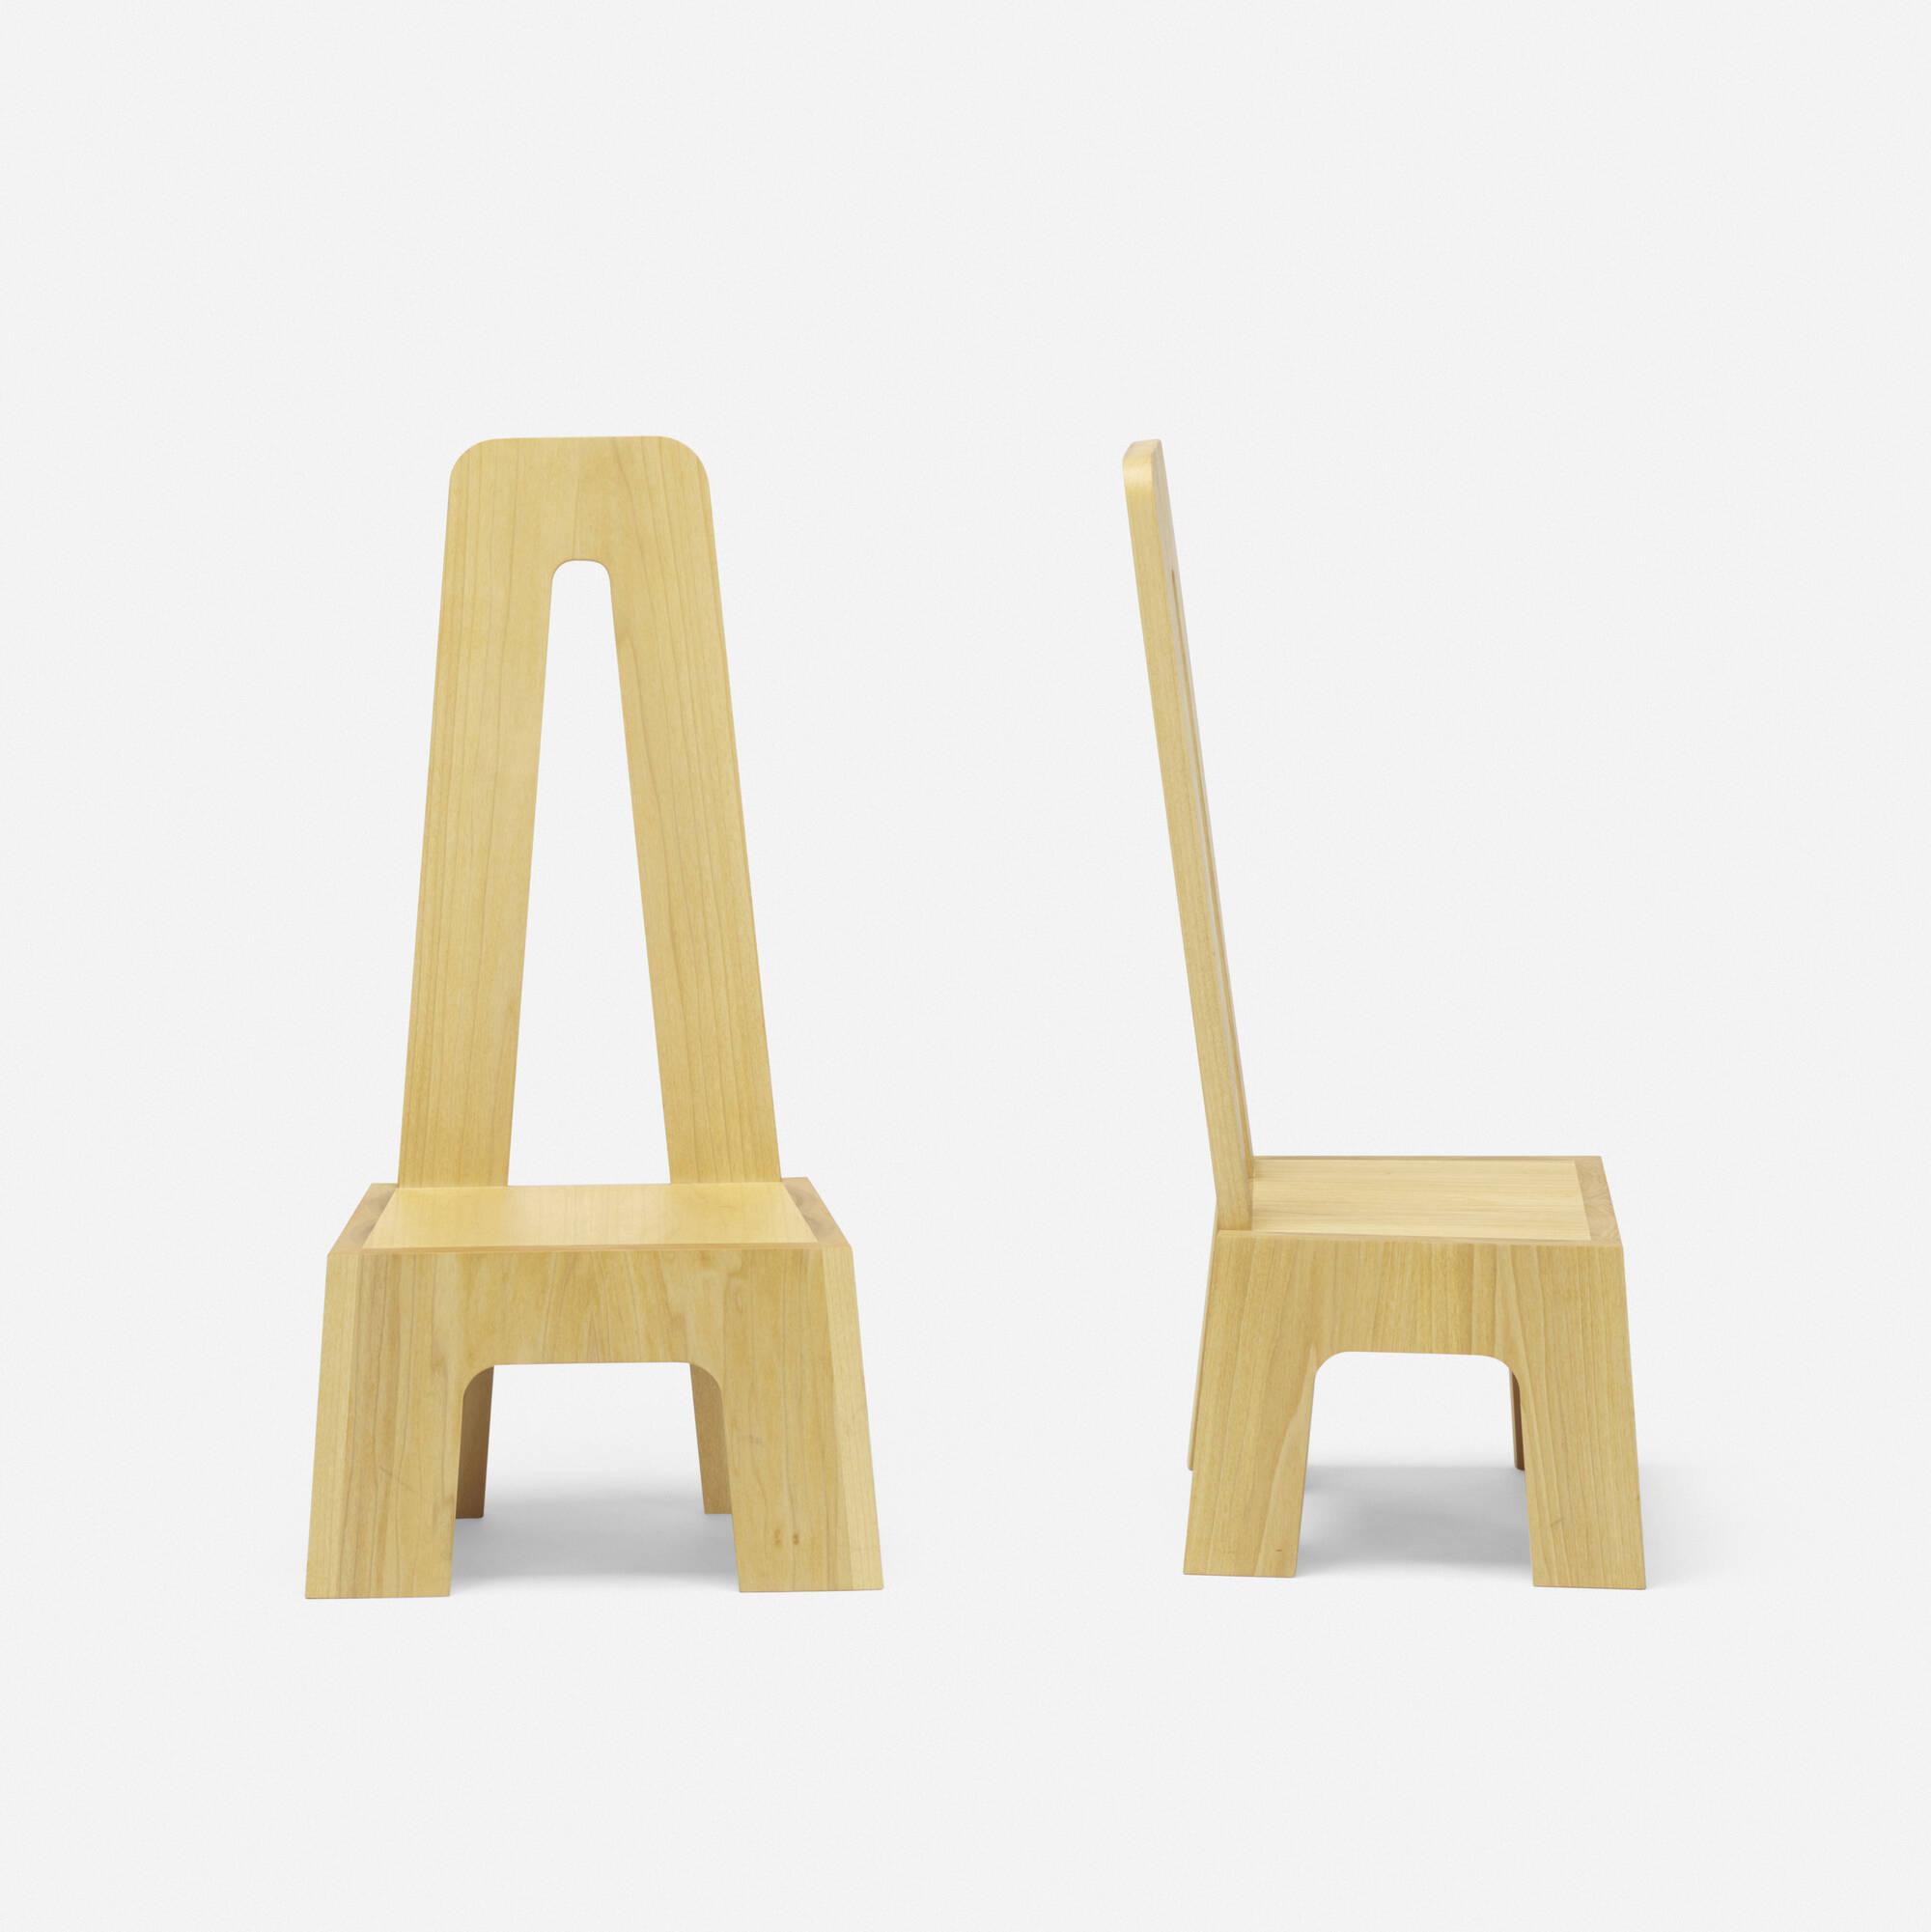 251: Richard Tuttle / Mesa chairs, pair (2 of 3)